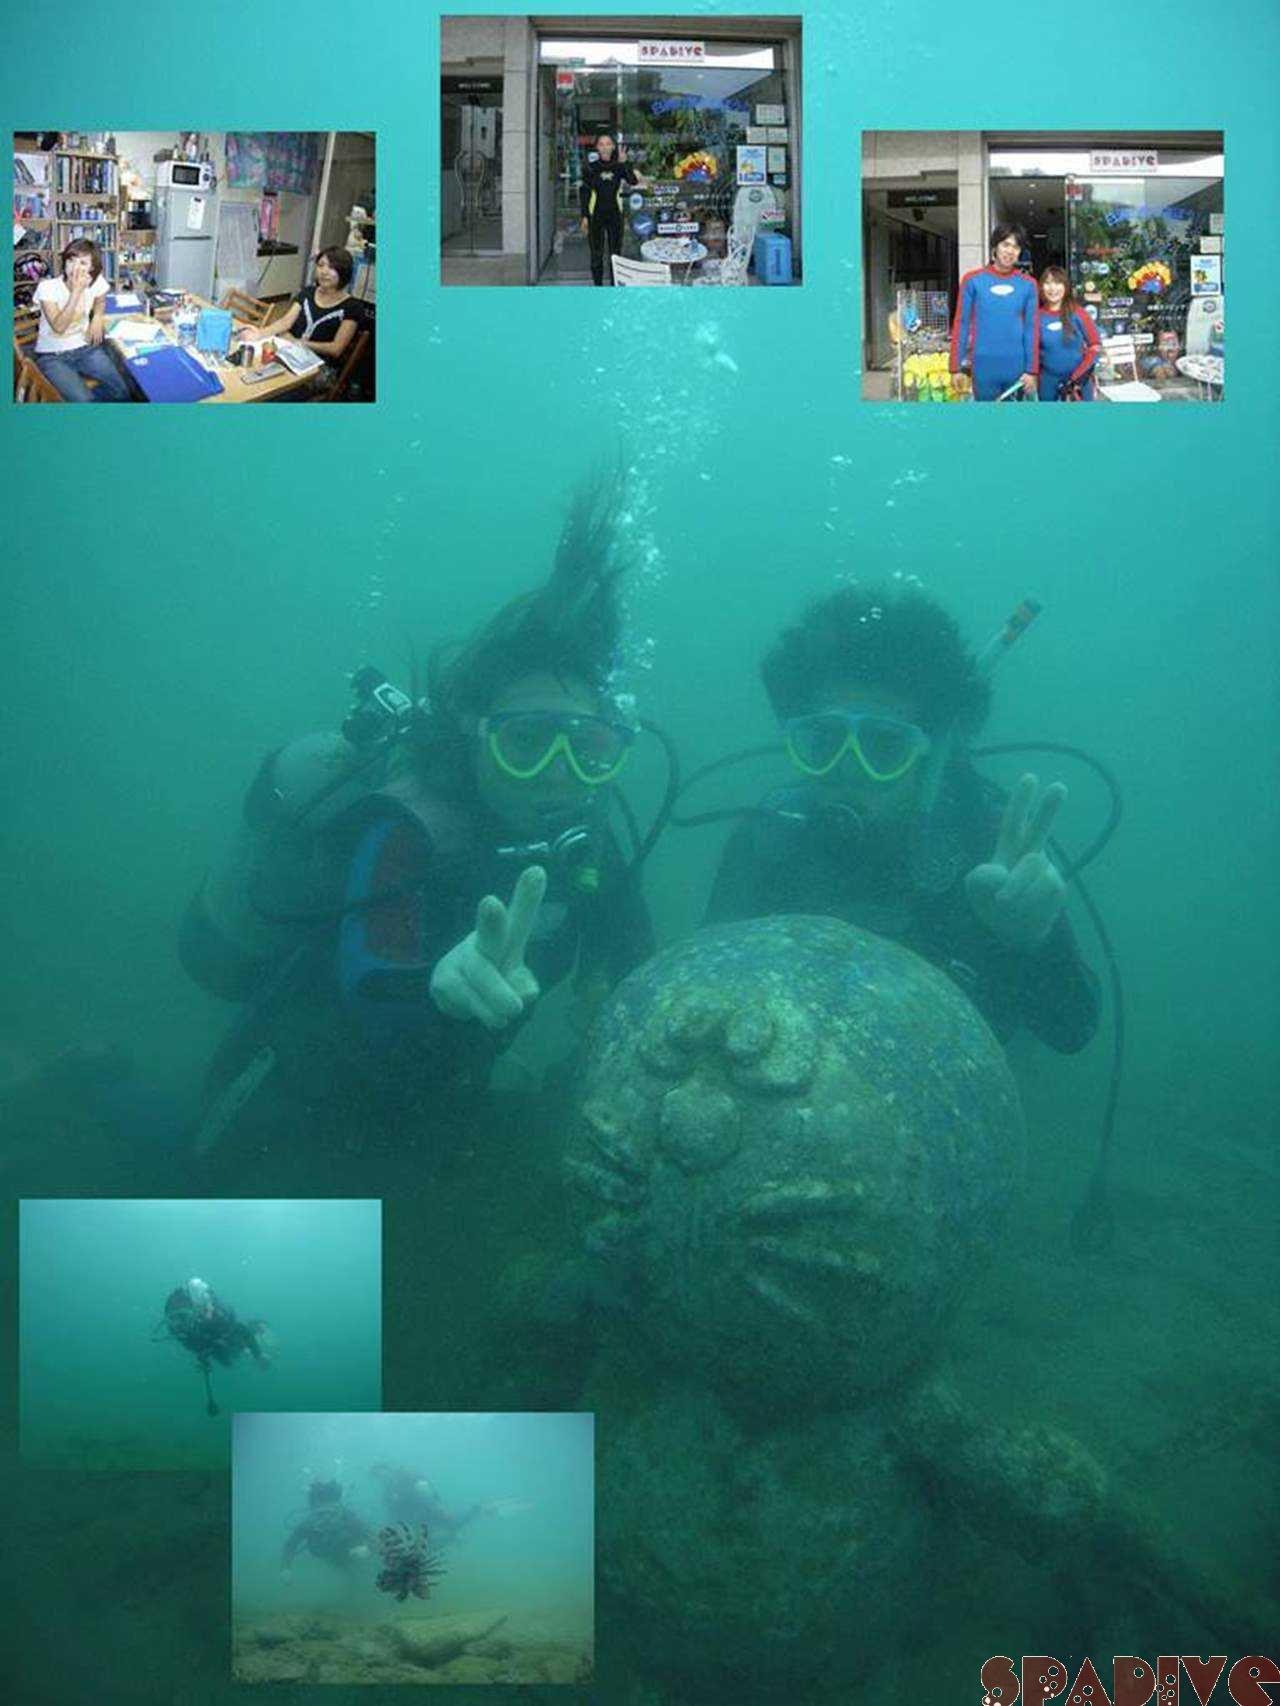 PPB中性浮力テーマダイブ&体験ダイビング|9/12/2007白浜権現崎